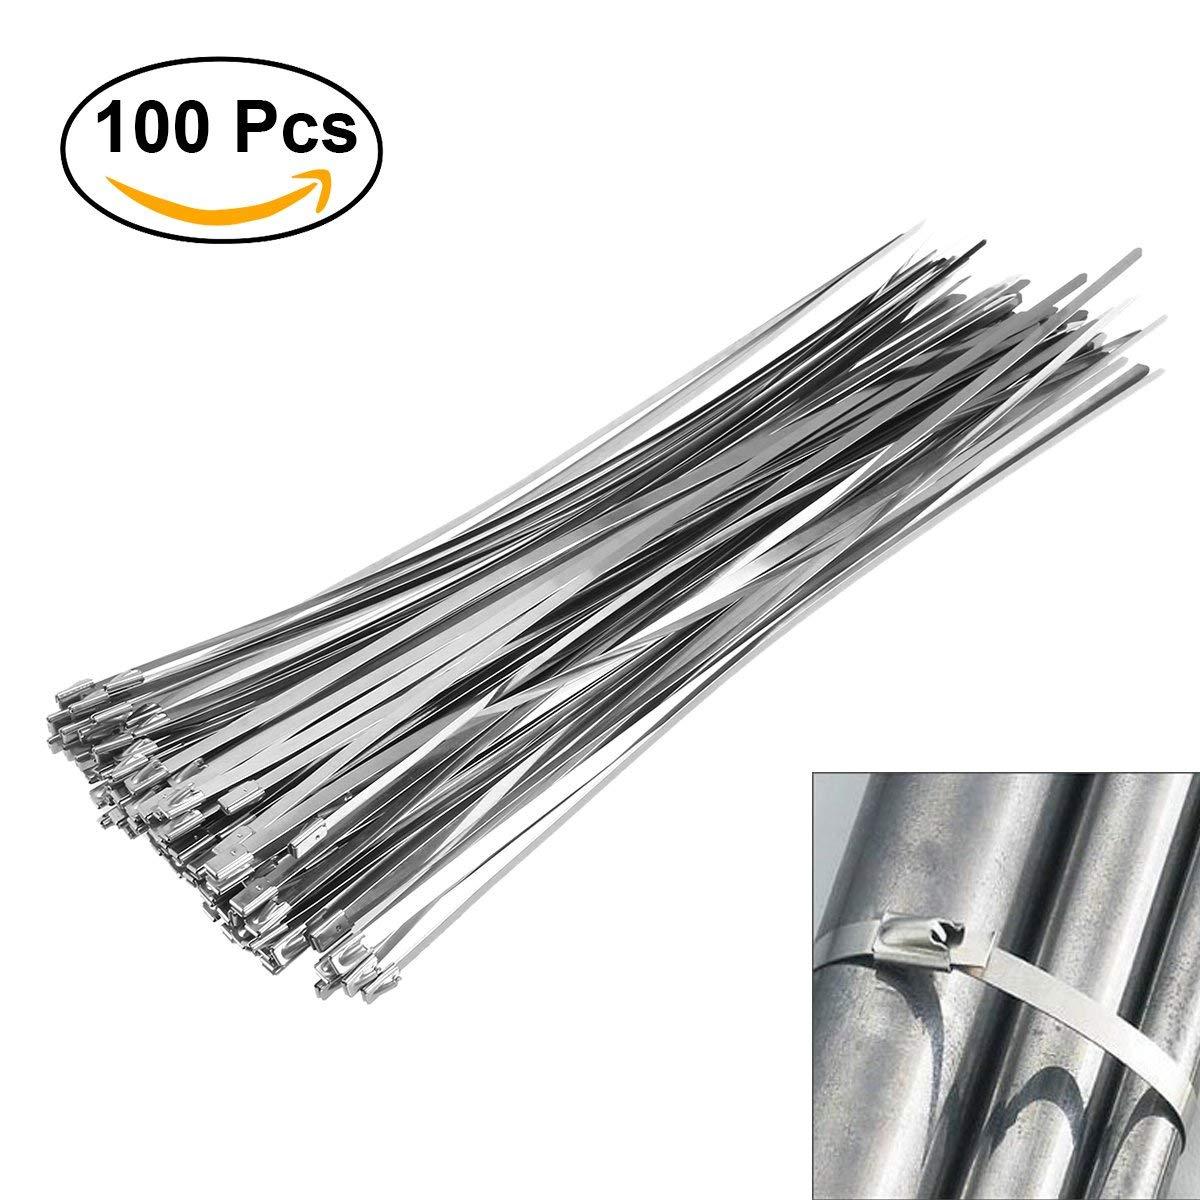 OUNONA 100pcs 4.6mm300mm Stainless Steel Cable Zip Ties Exhaust Wrap Multi-Purpos Locking Cable Metal Zip Ties